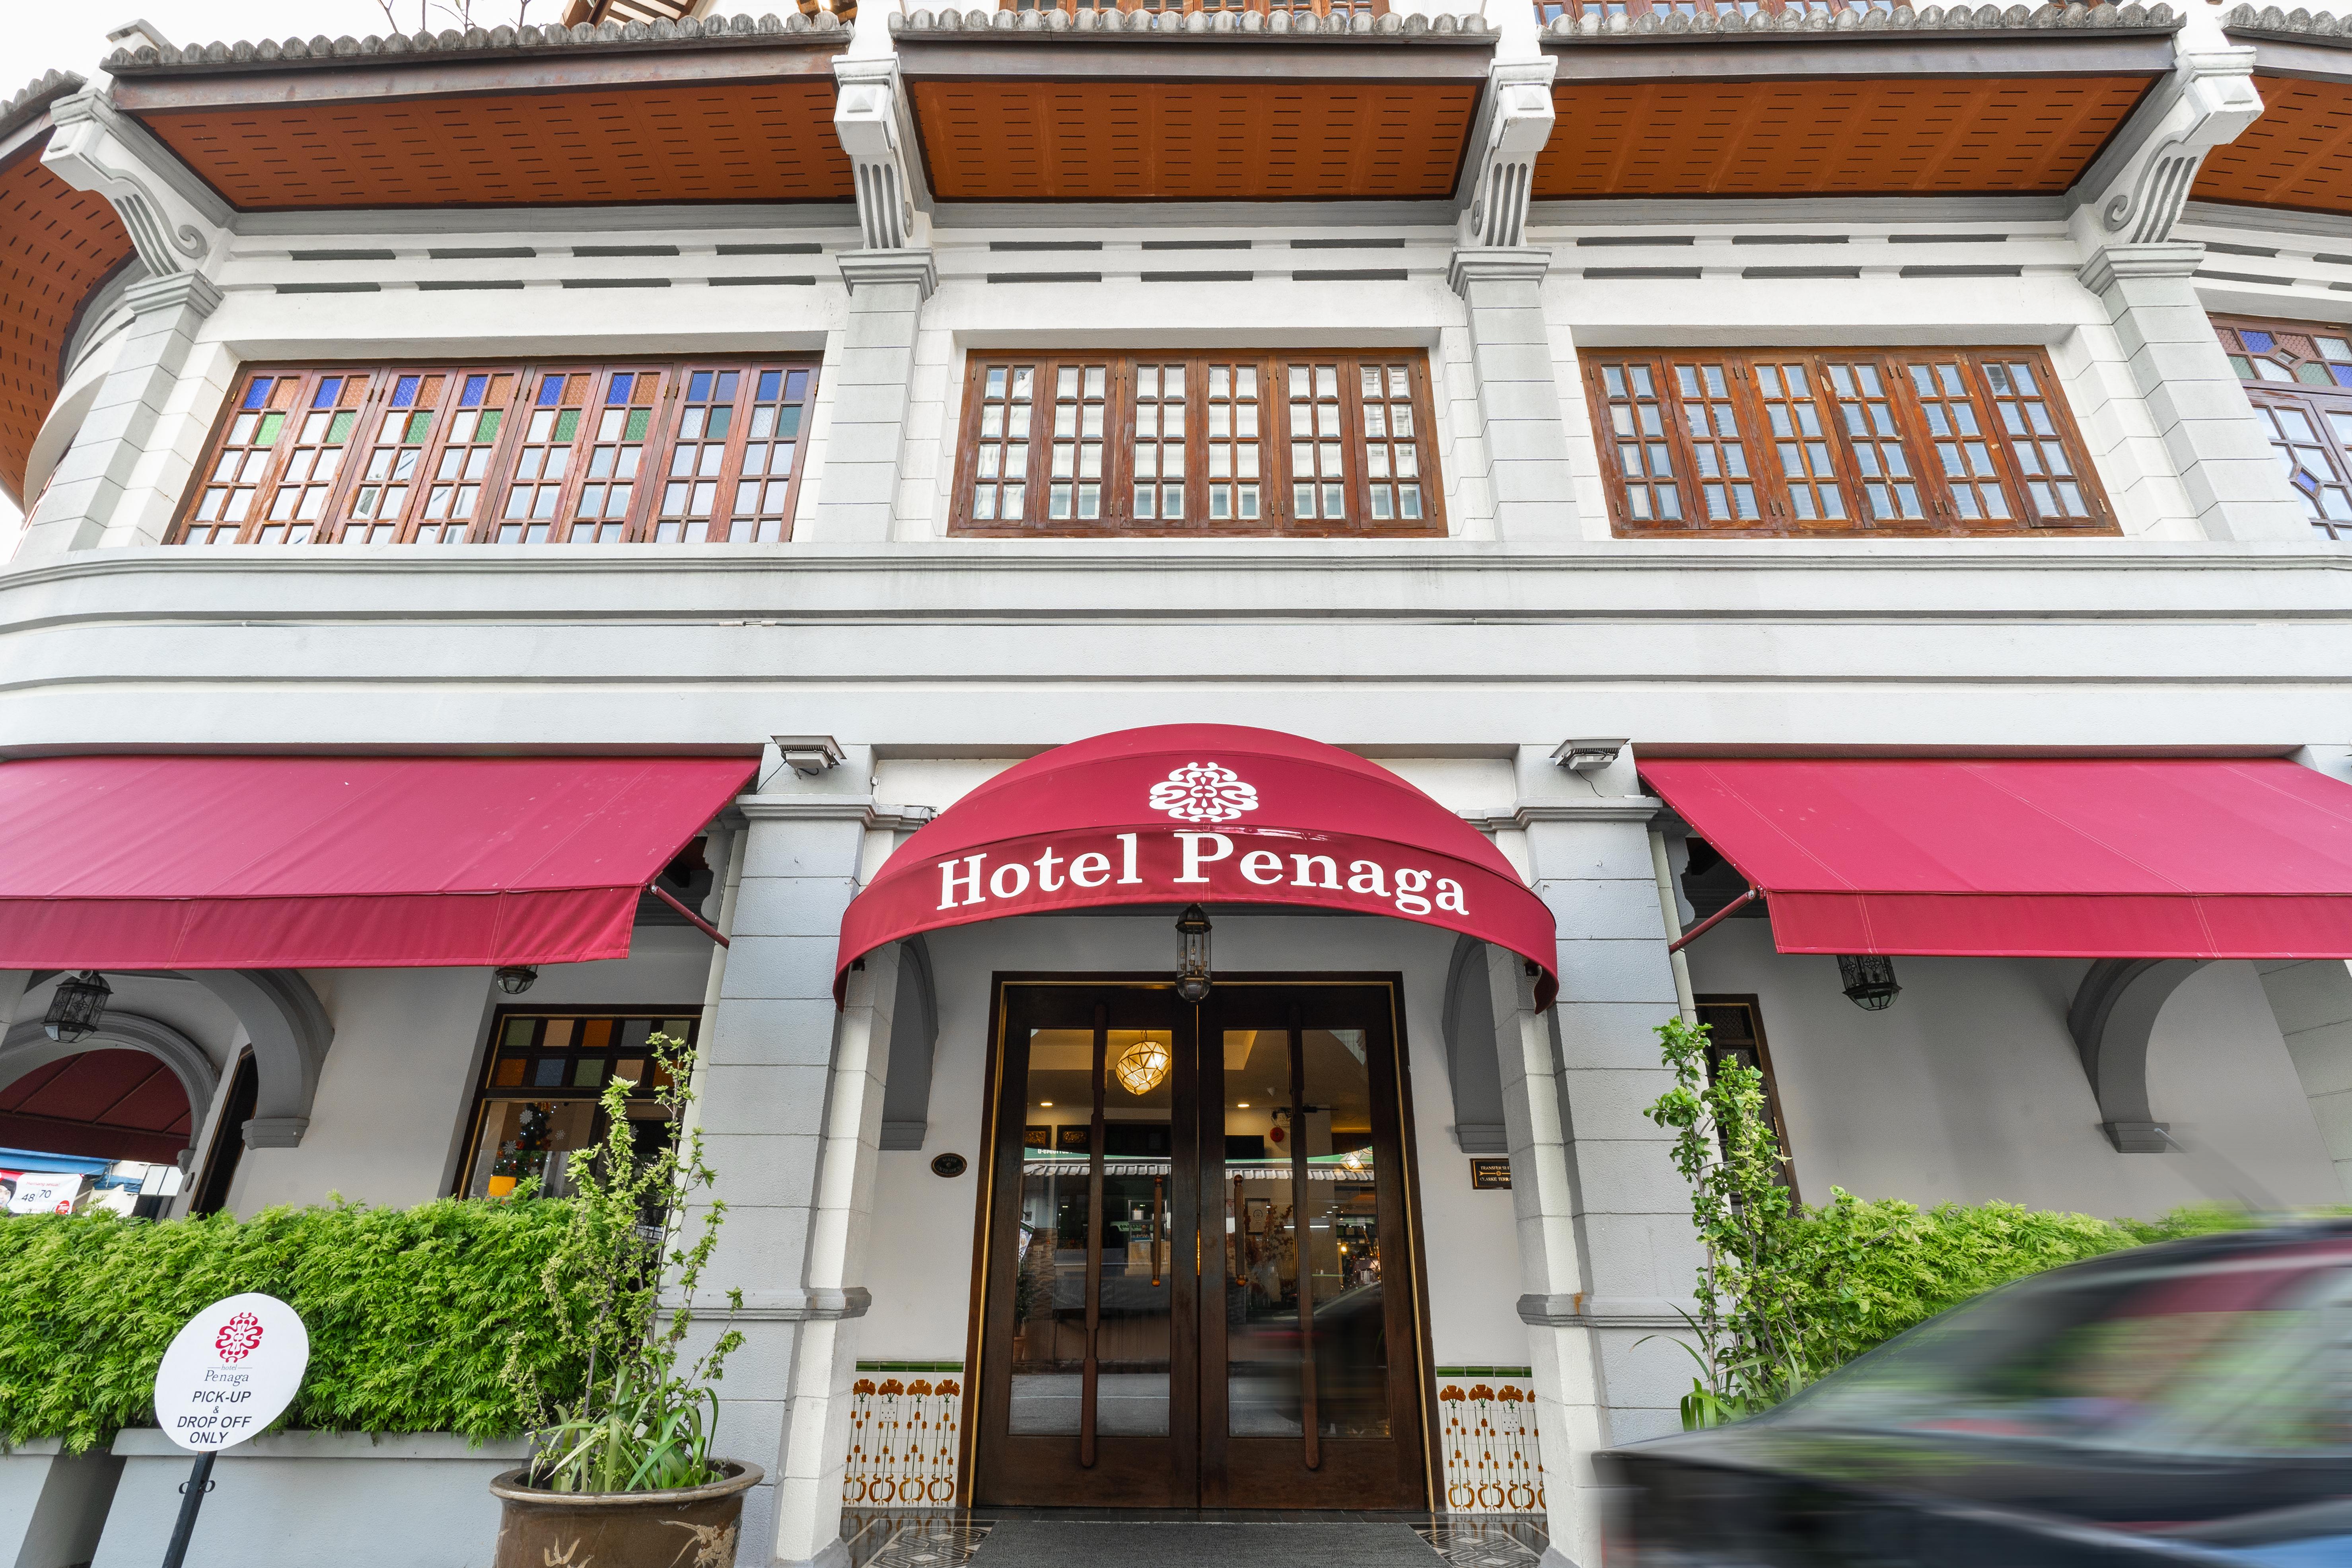 Hotel Penaga - Entrance